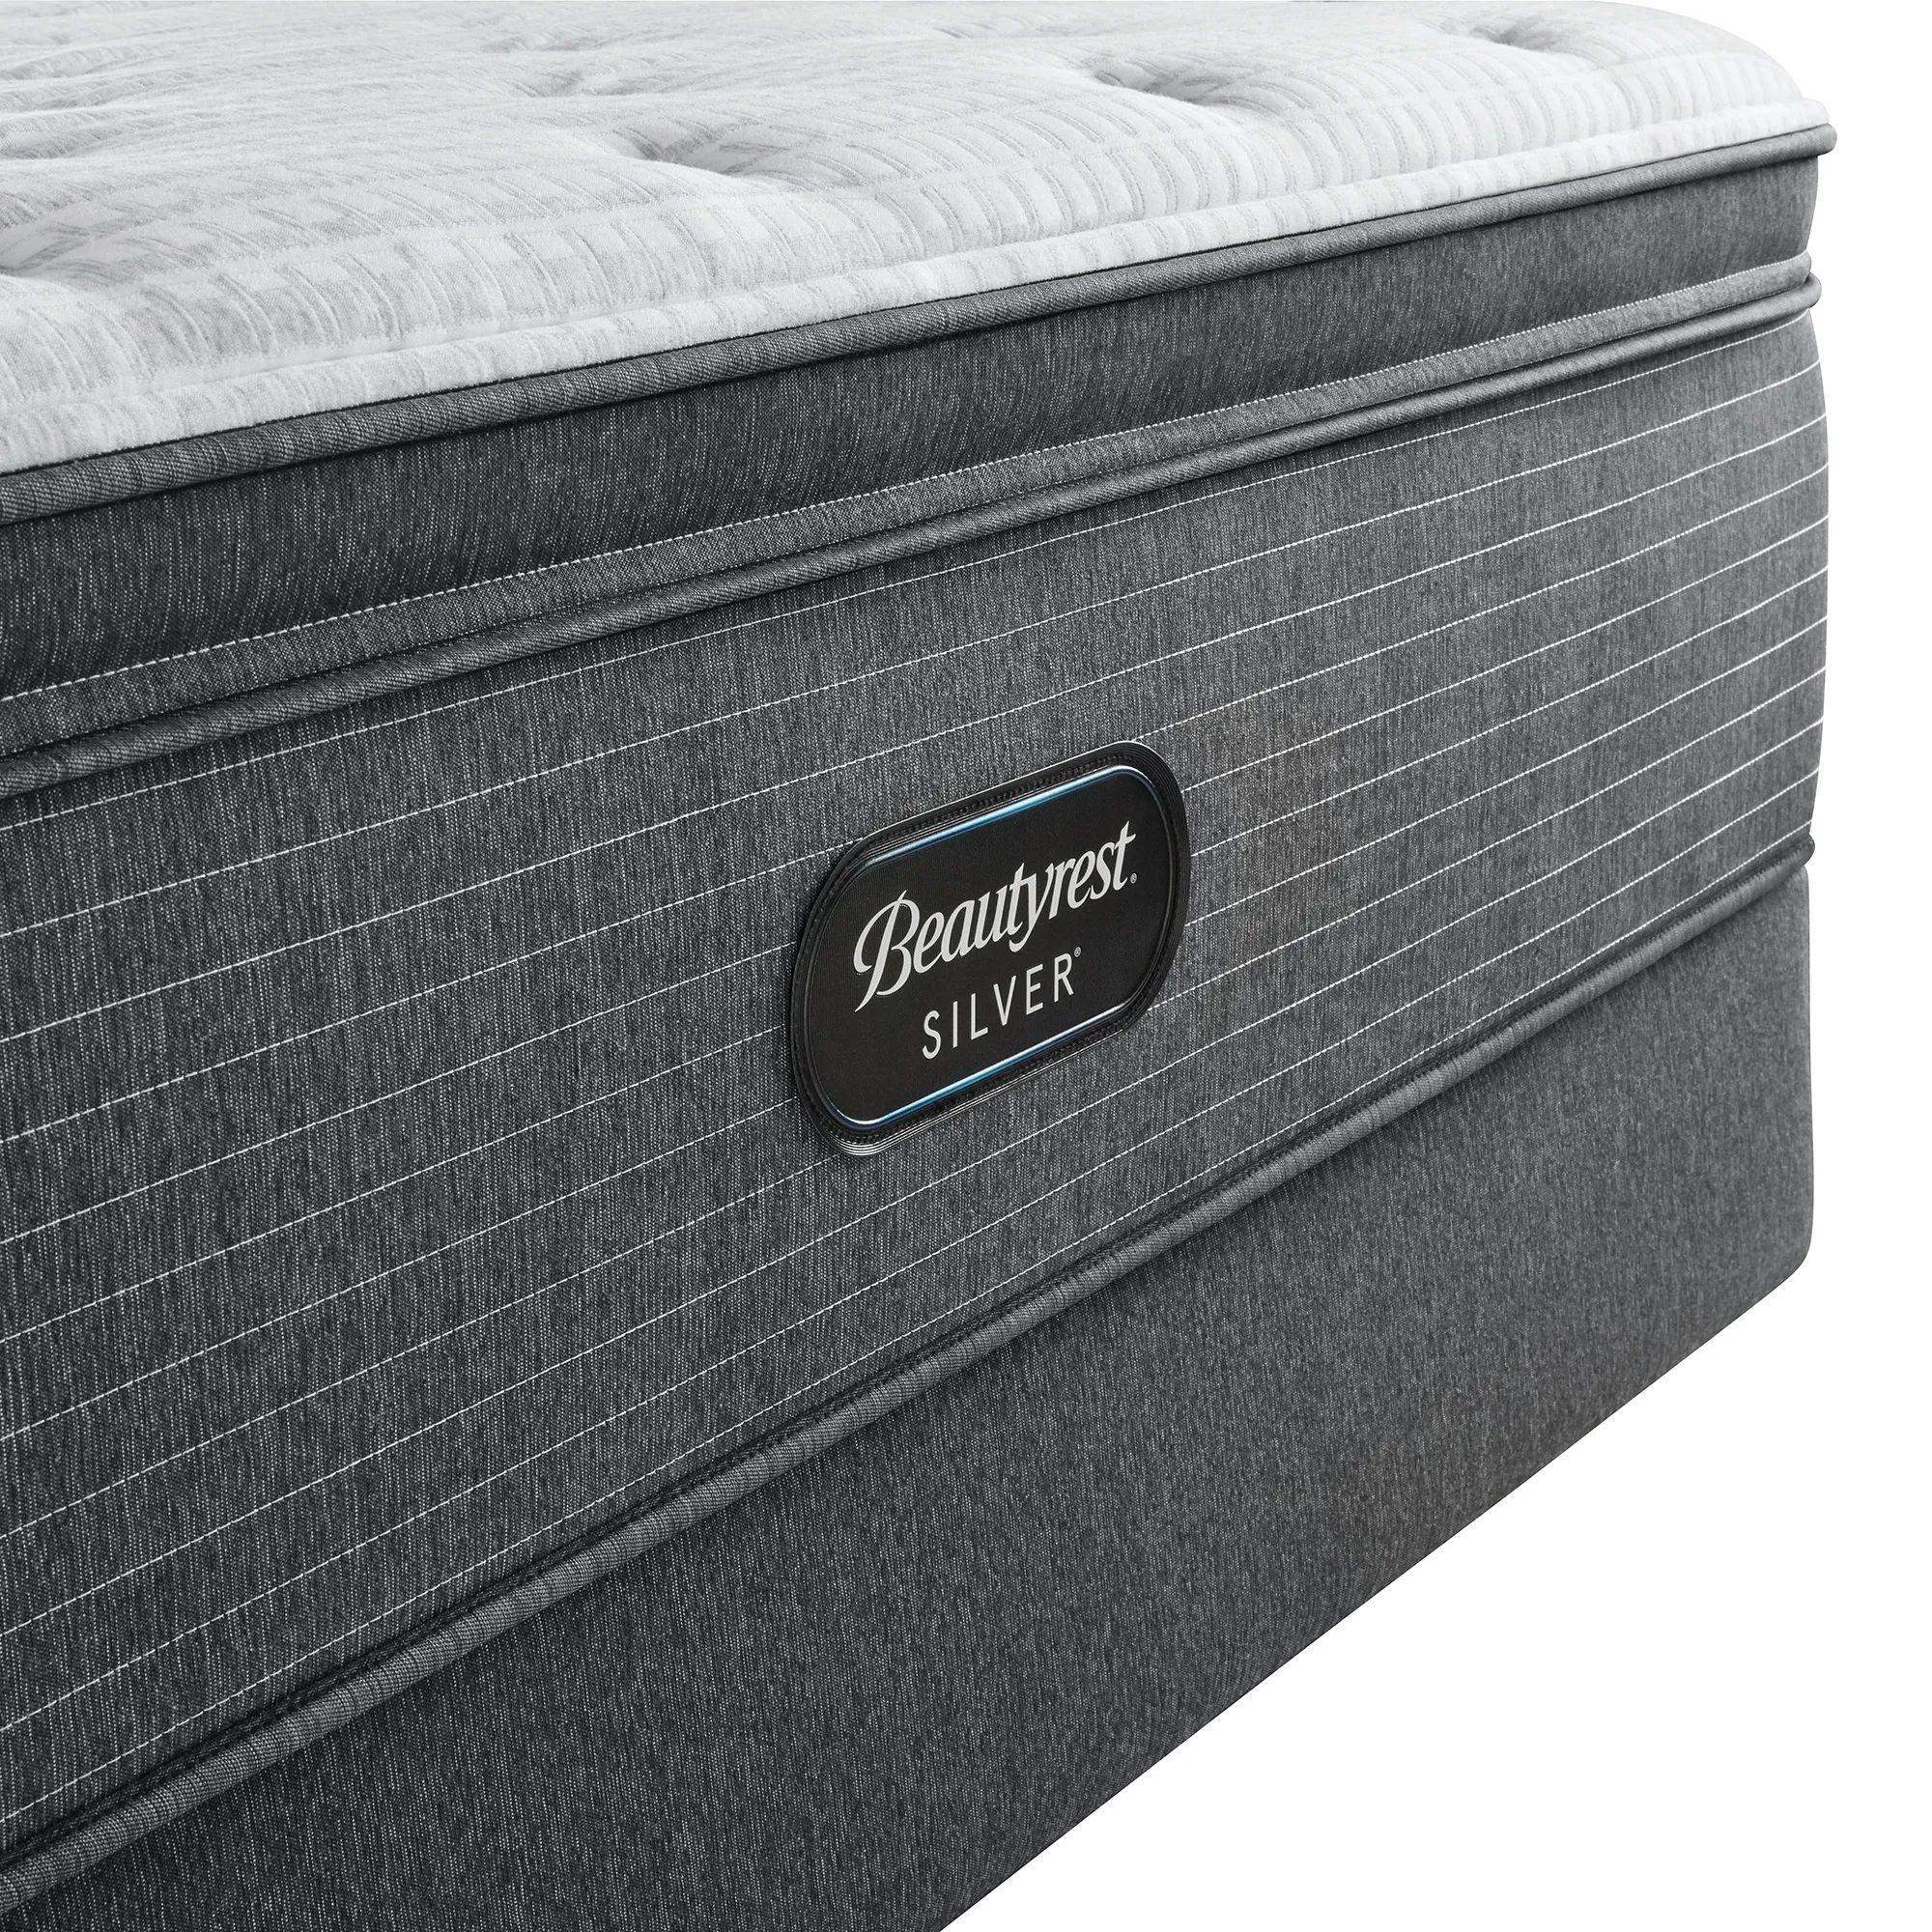 king simmons beautyrest silver level 2 brs900 c plush pillow top 16 inch mattress